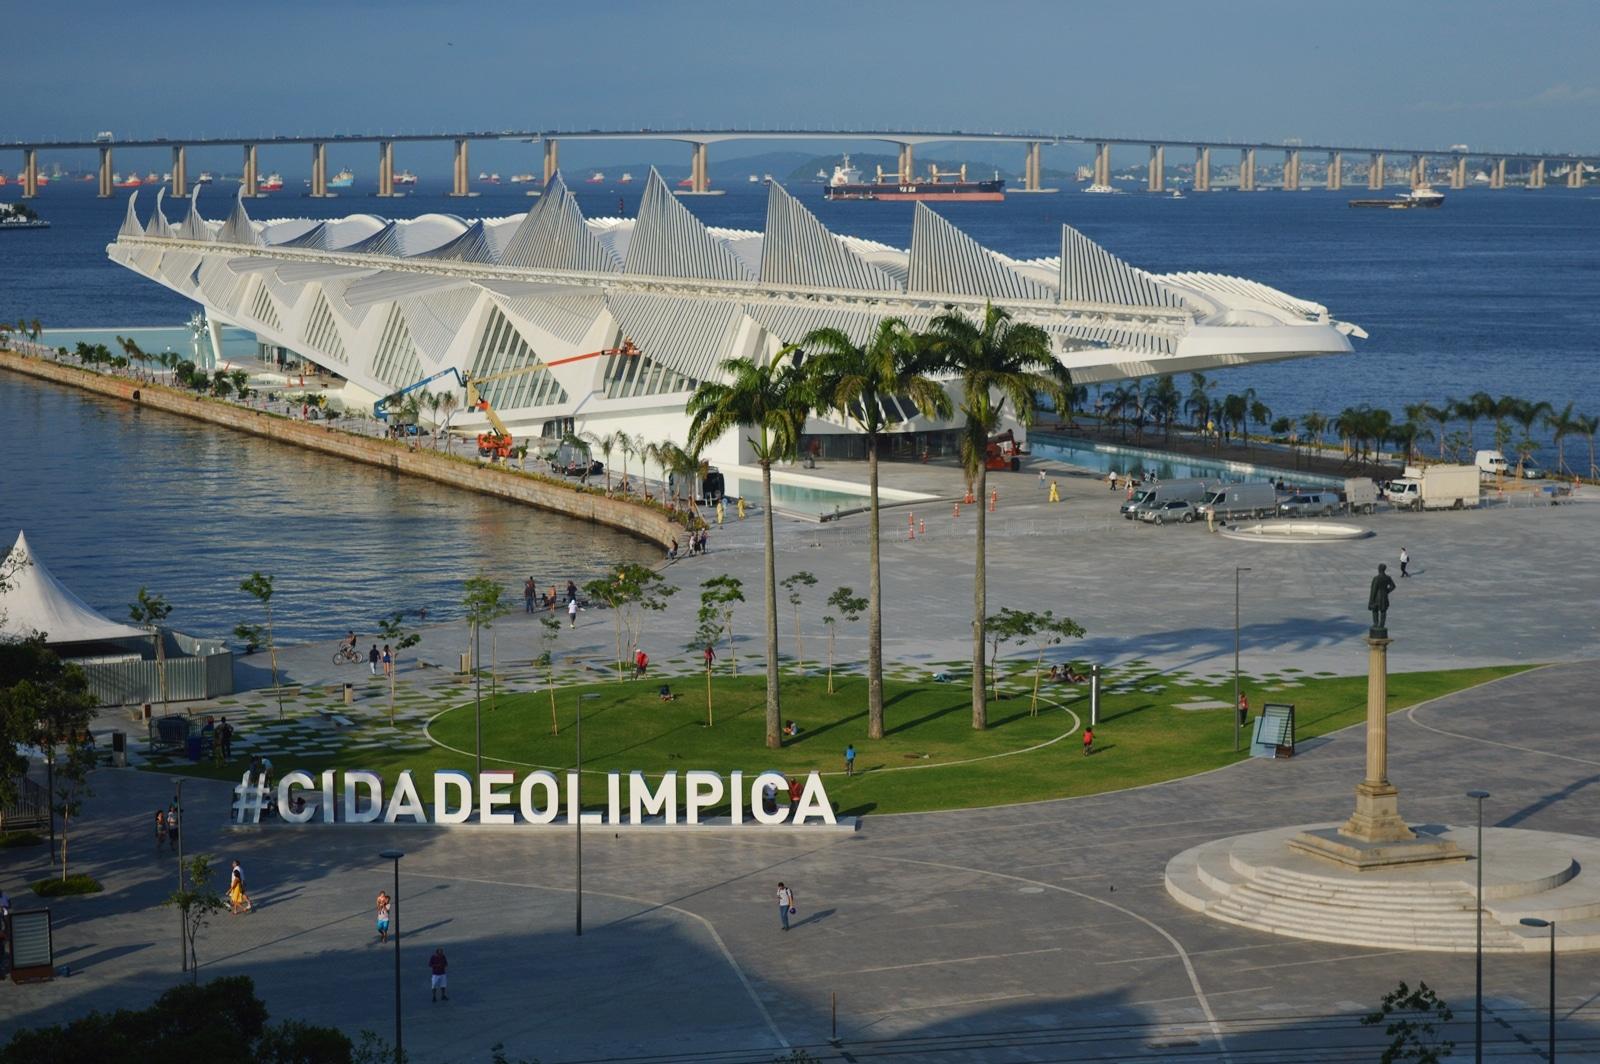 Museum of Tomorrow, in the Porturia Zone